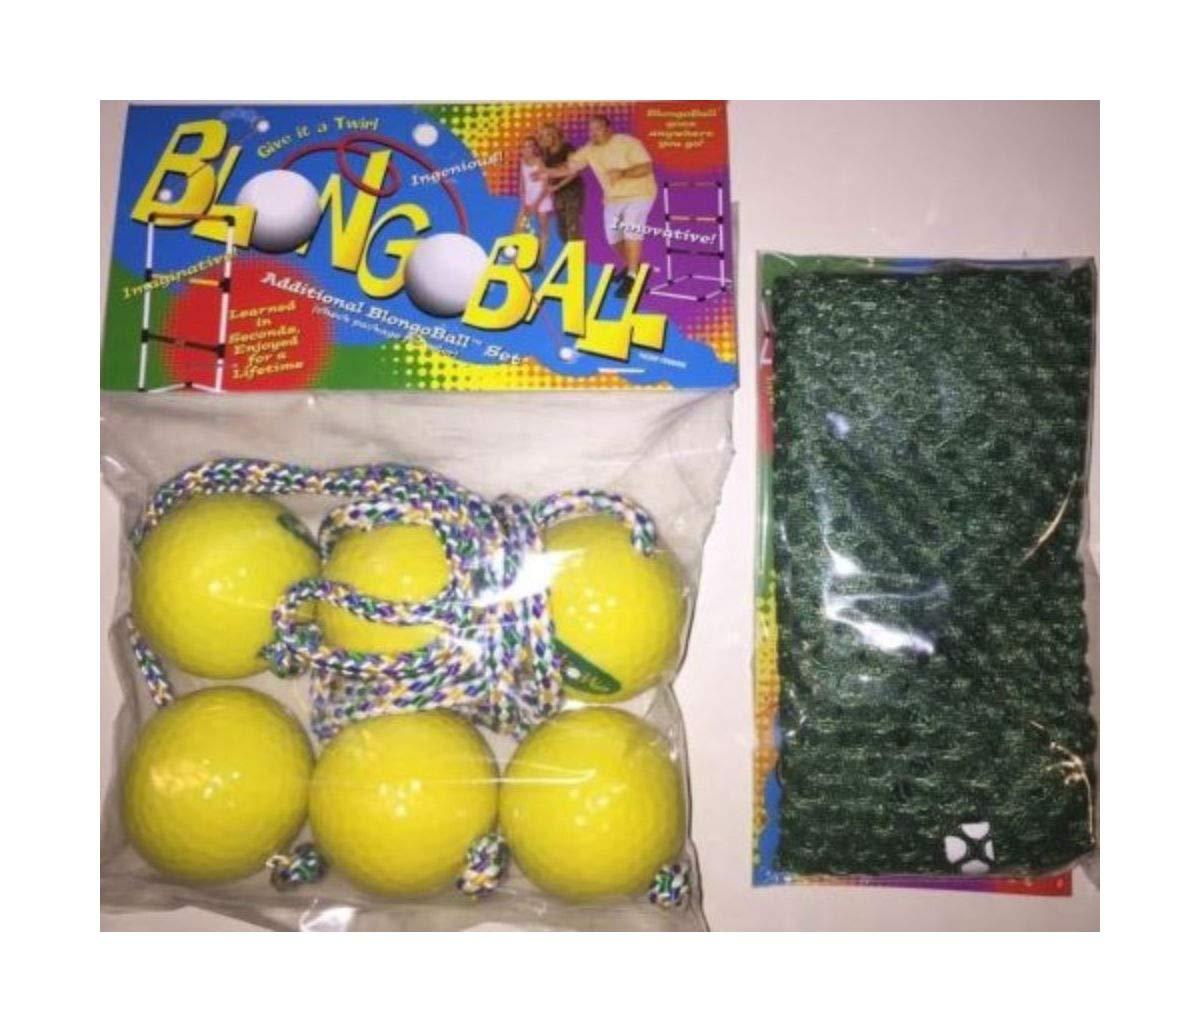 3 Yellow Ladder Balls Bolo Toss Hillbilly Golf Free CASE Skallywags Depot by Unknown